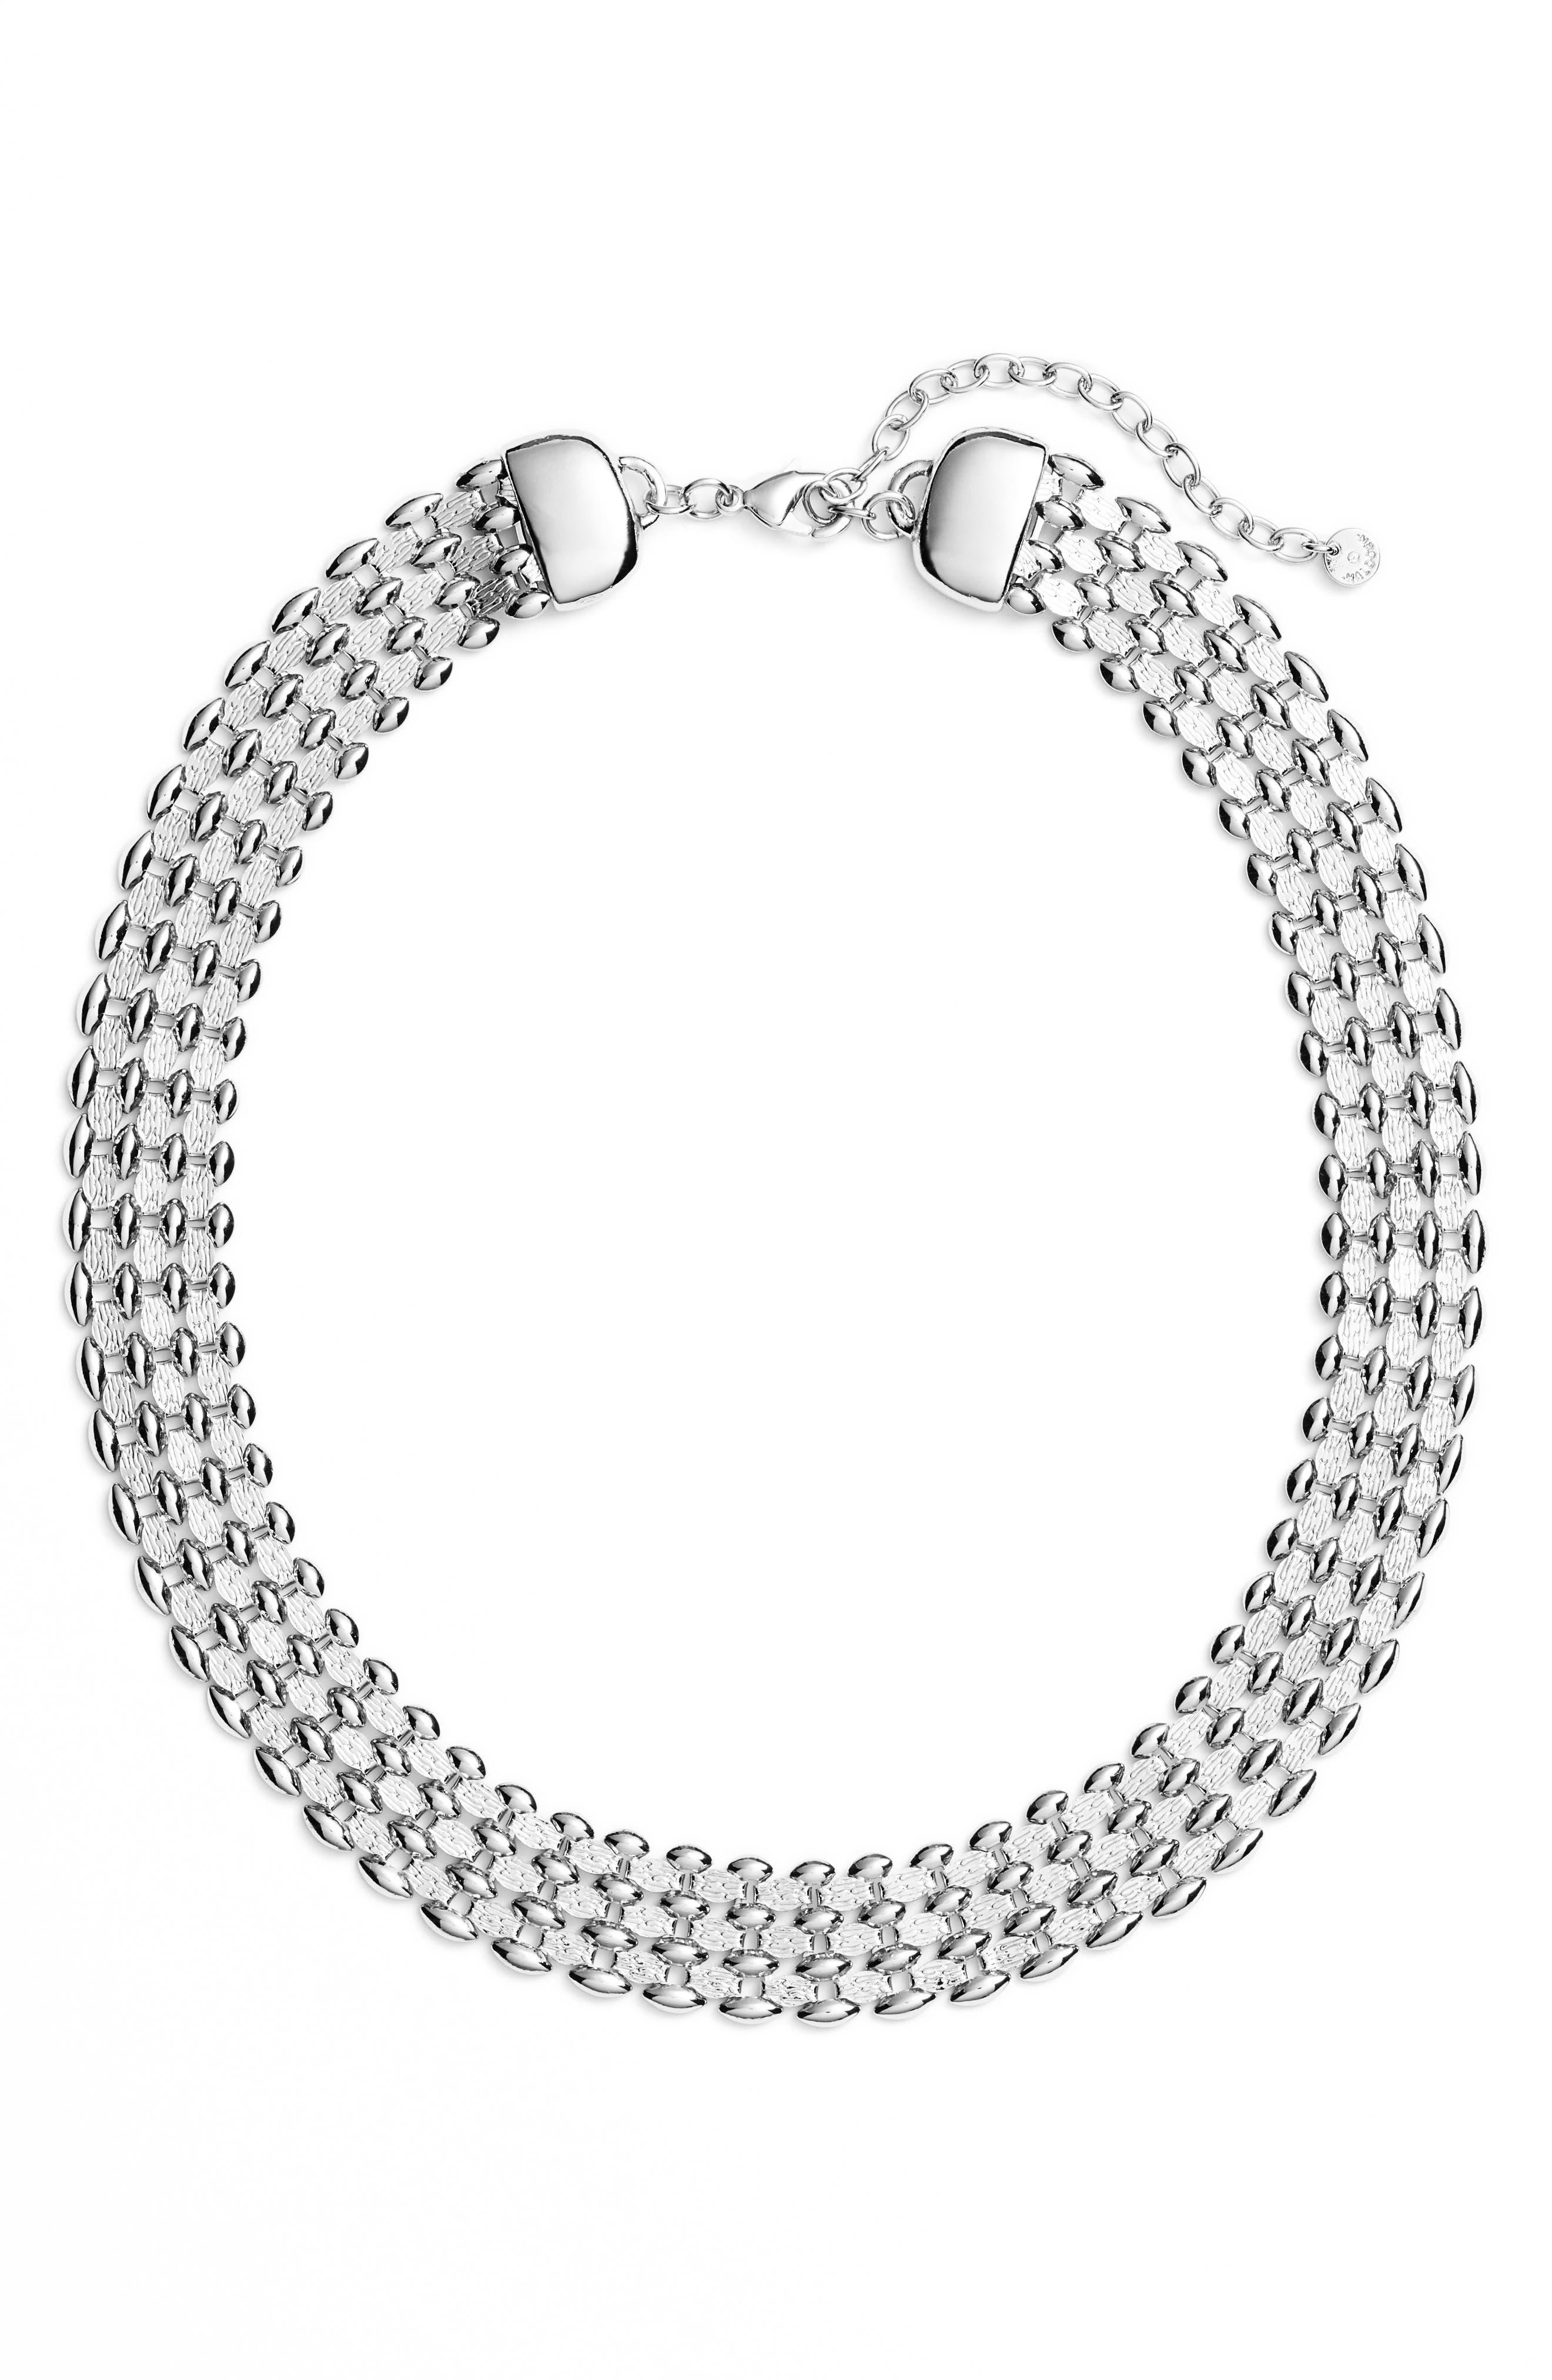 Glimmer Chain Collar,                             Main thumbnail 1, color,                             040